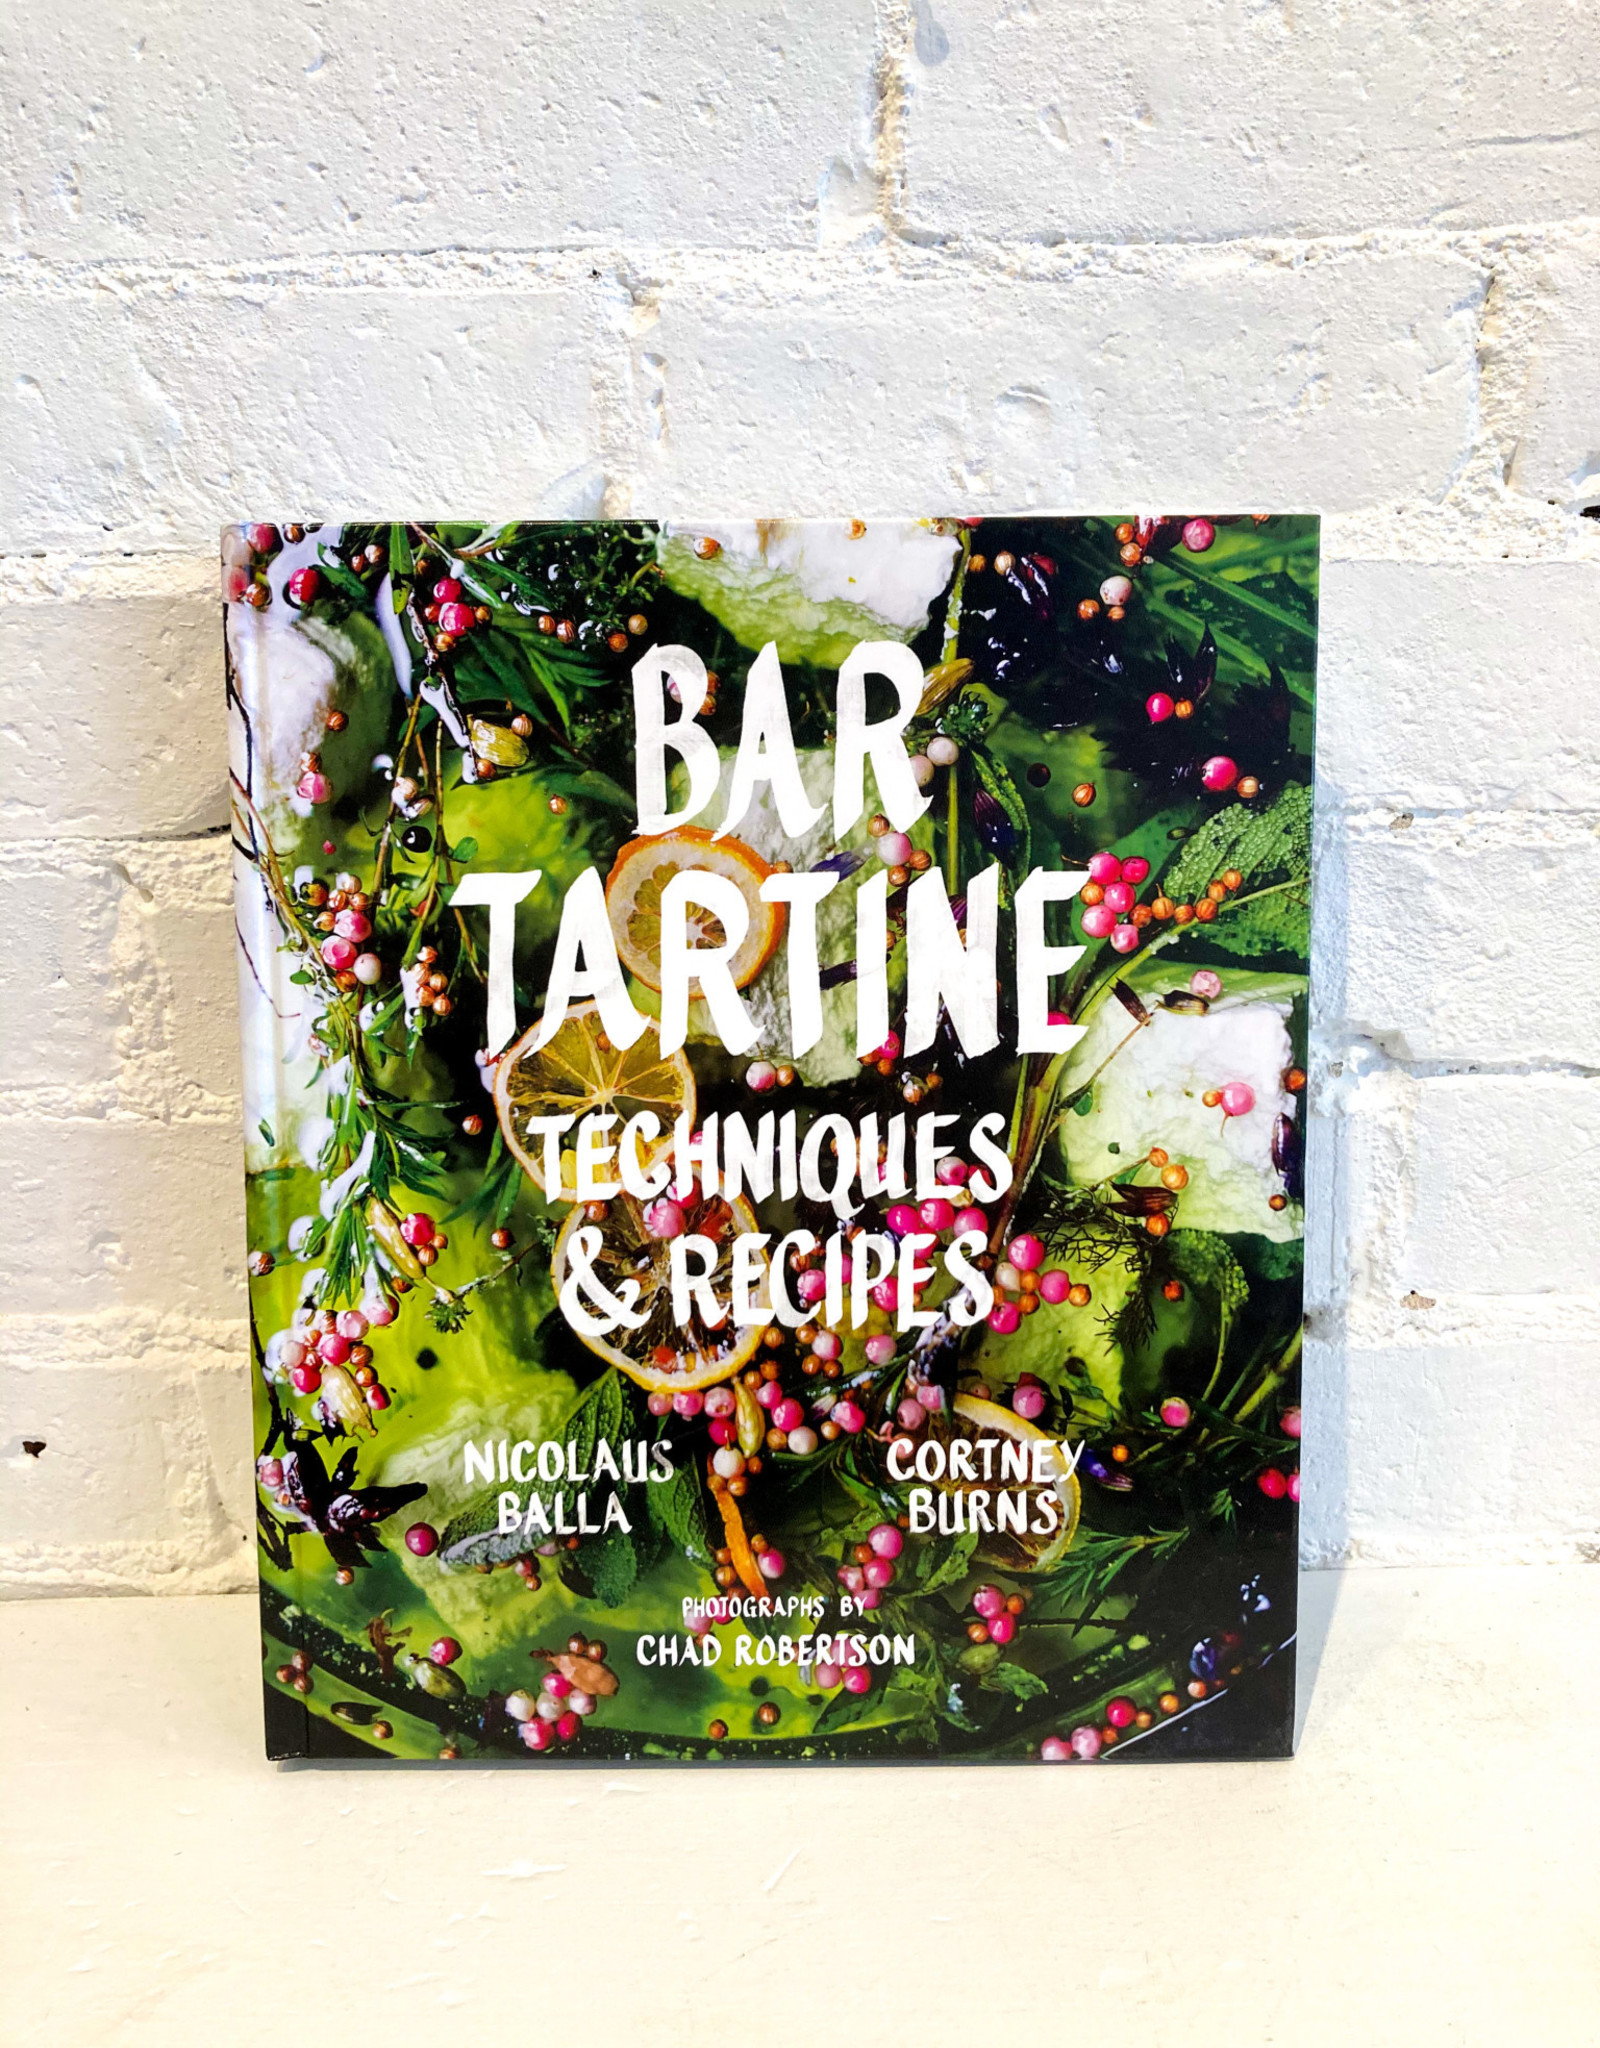 Bar Tartine by Nicolaus Balla & Cortney Burns